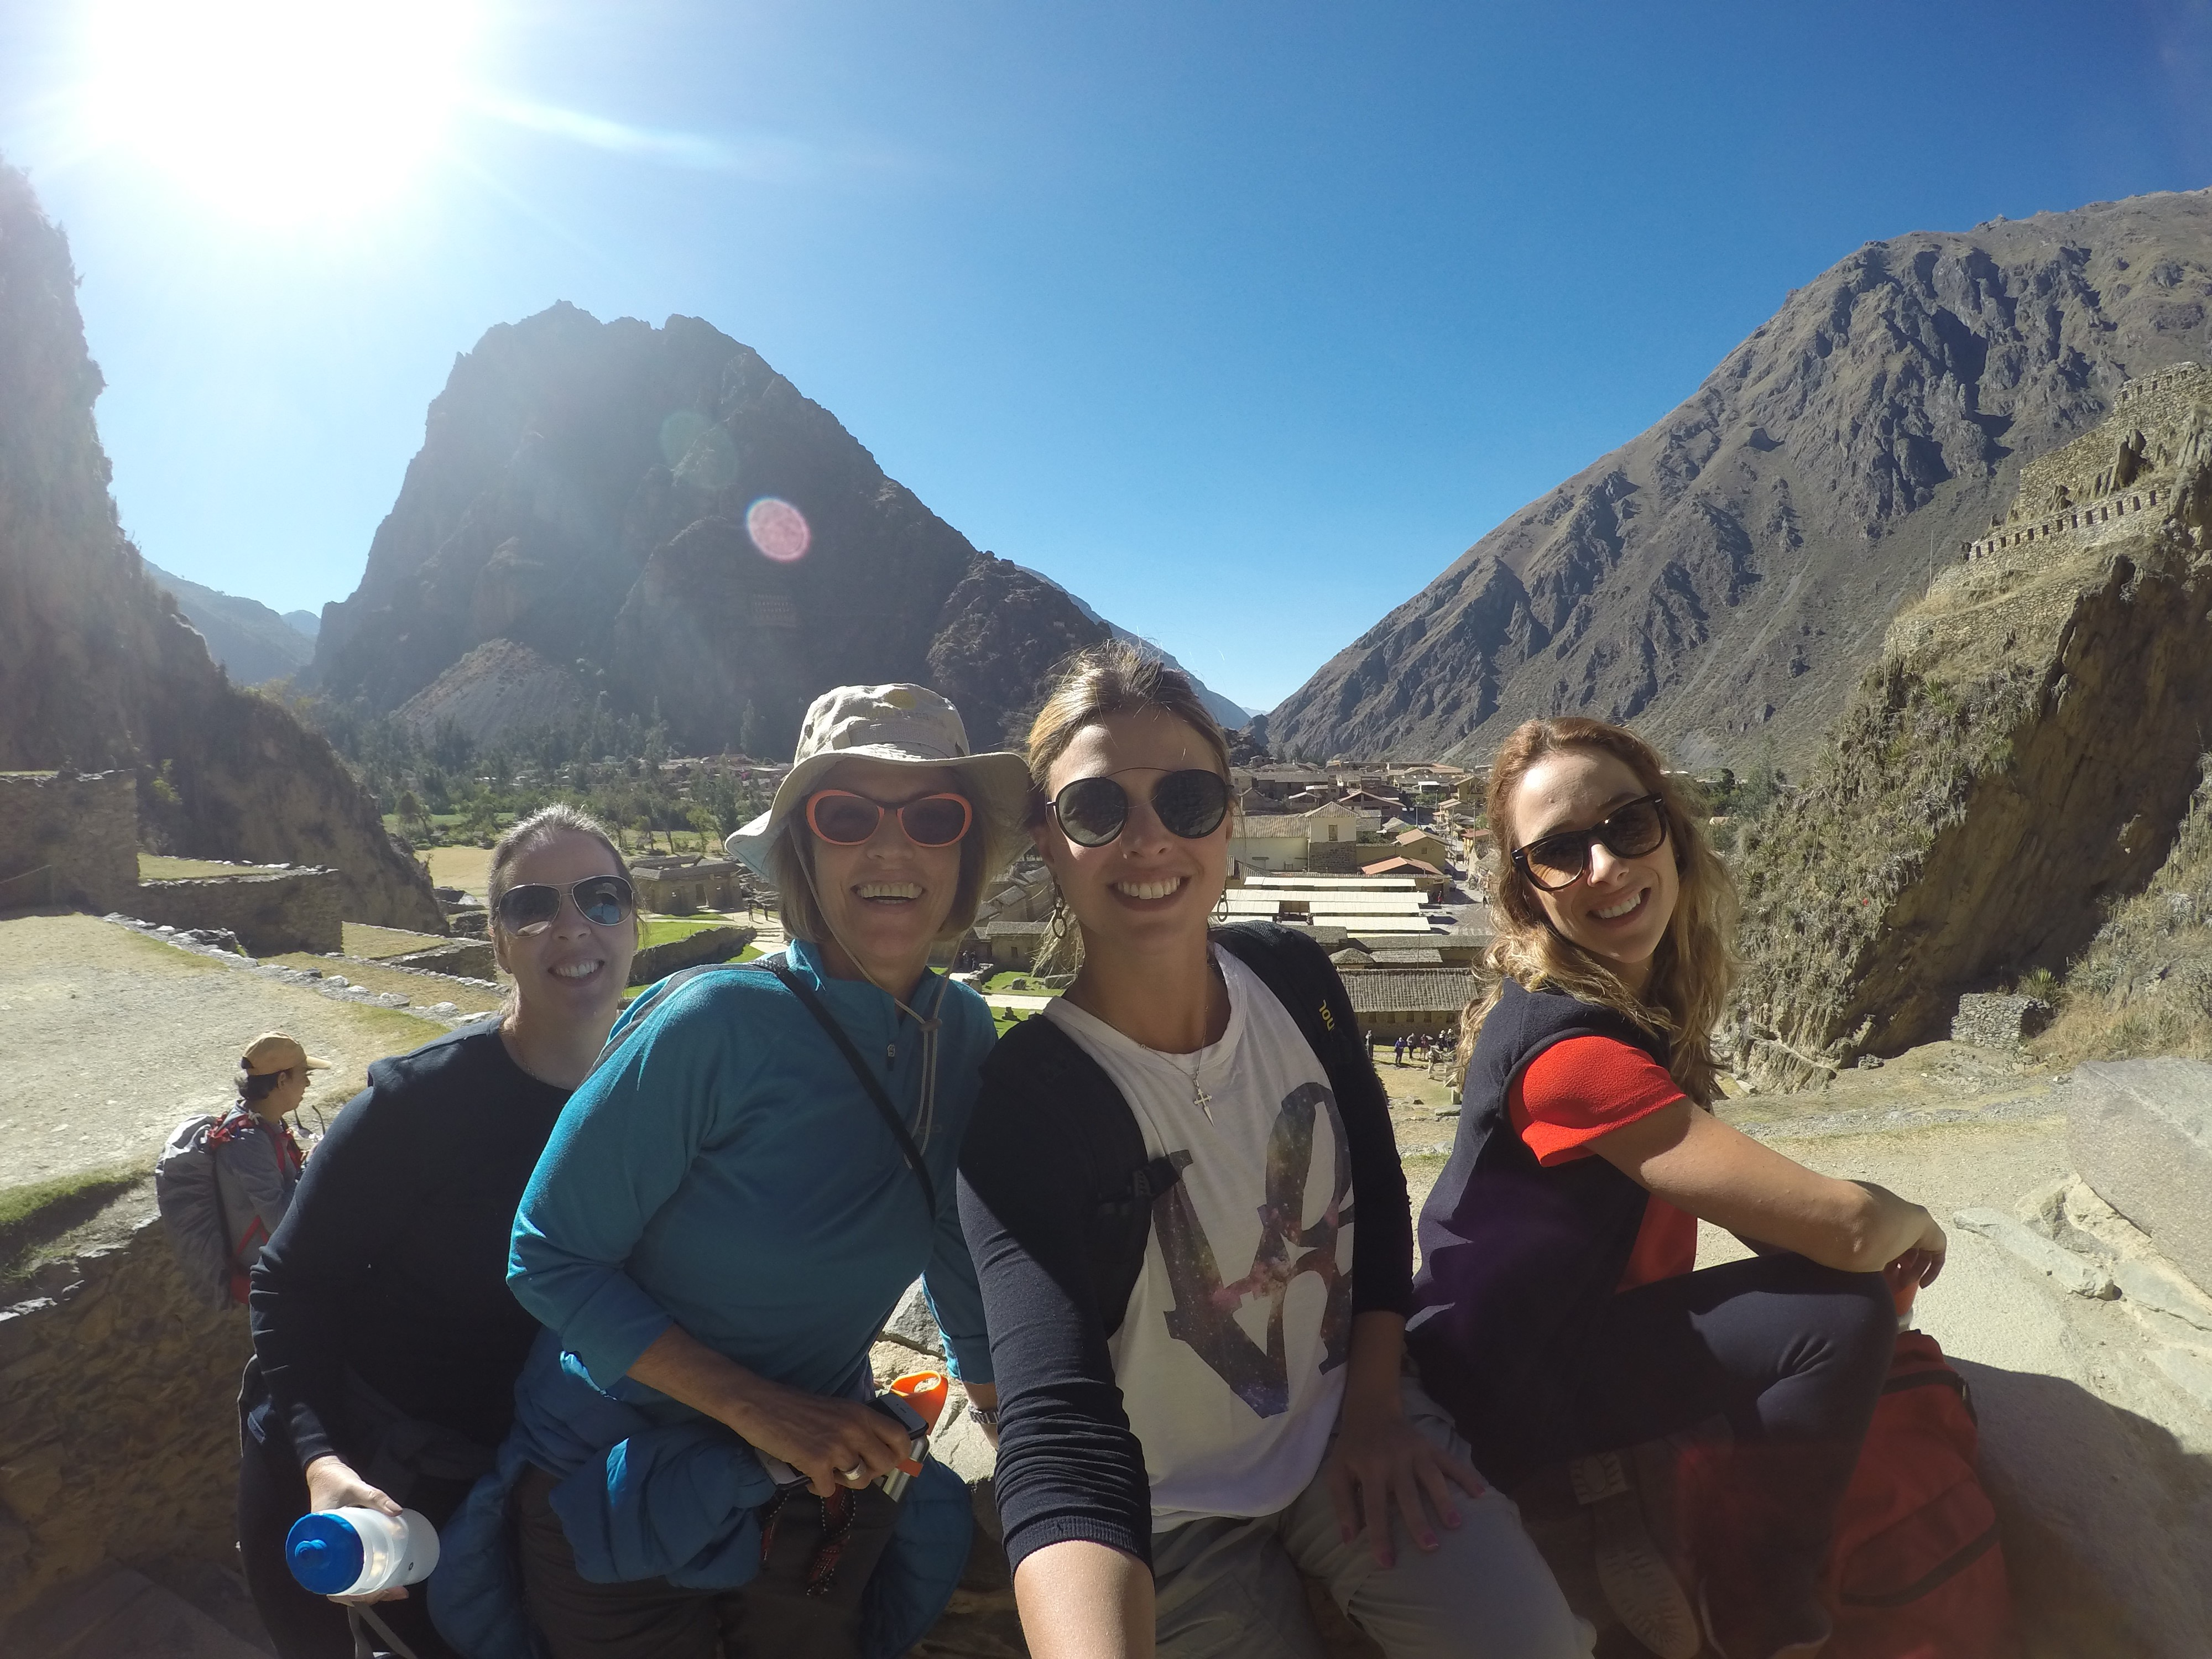 Cris, Caty, Paty e Jaque no Parque Arqueológico Nacional Ollantaytambo